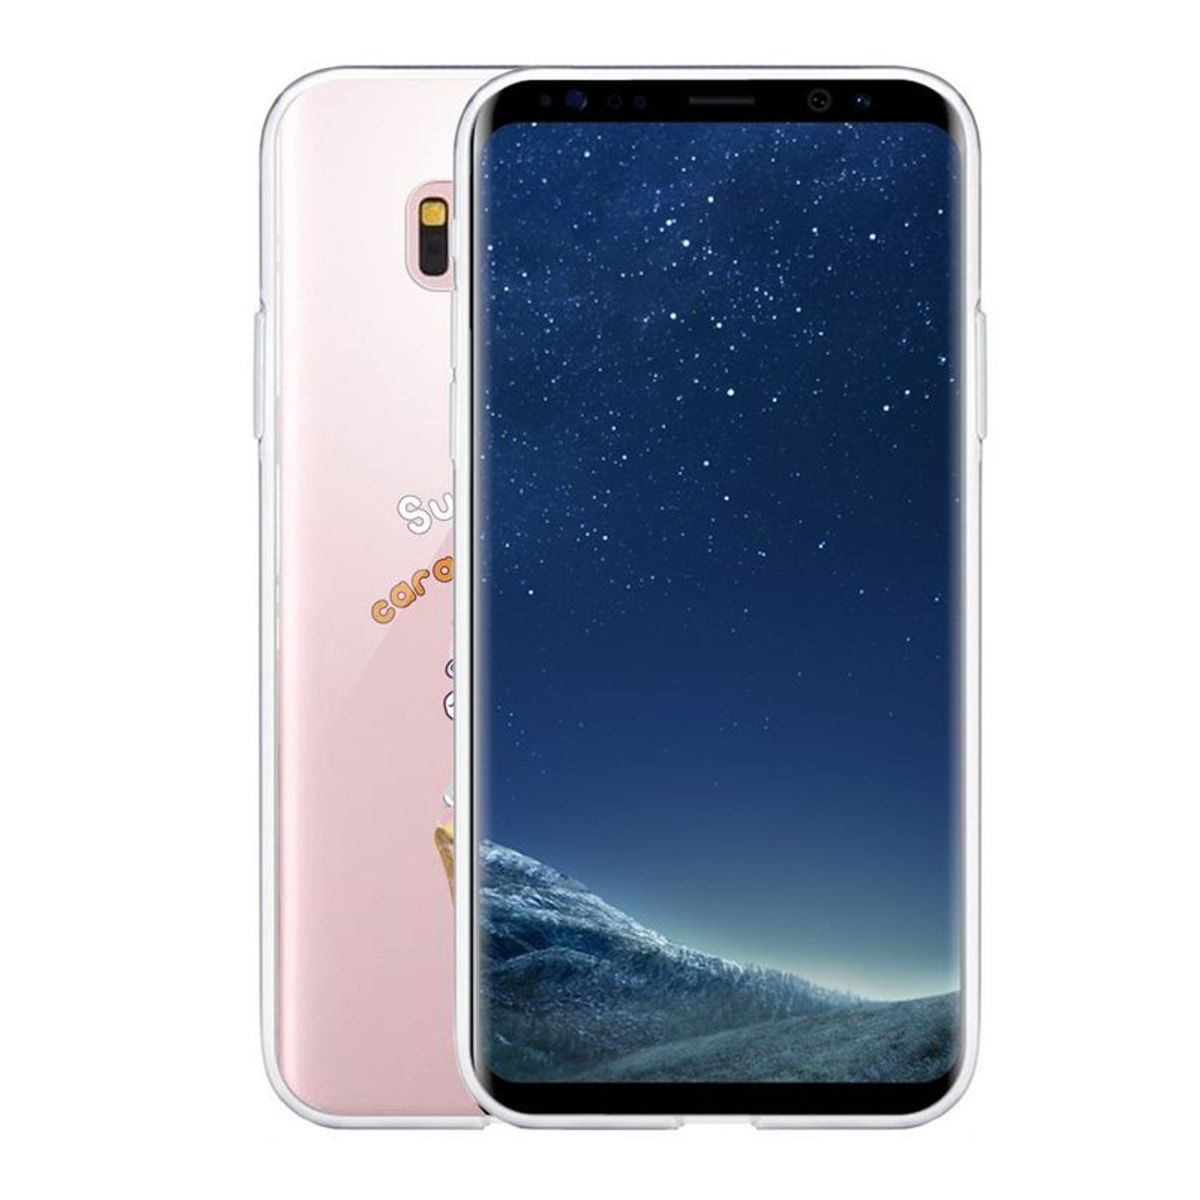 Coque 360 Samsung Galaxy S8 360 Integrale Transparente